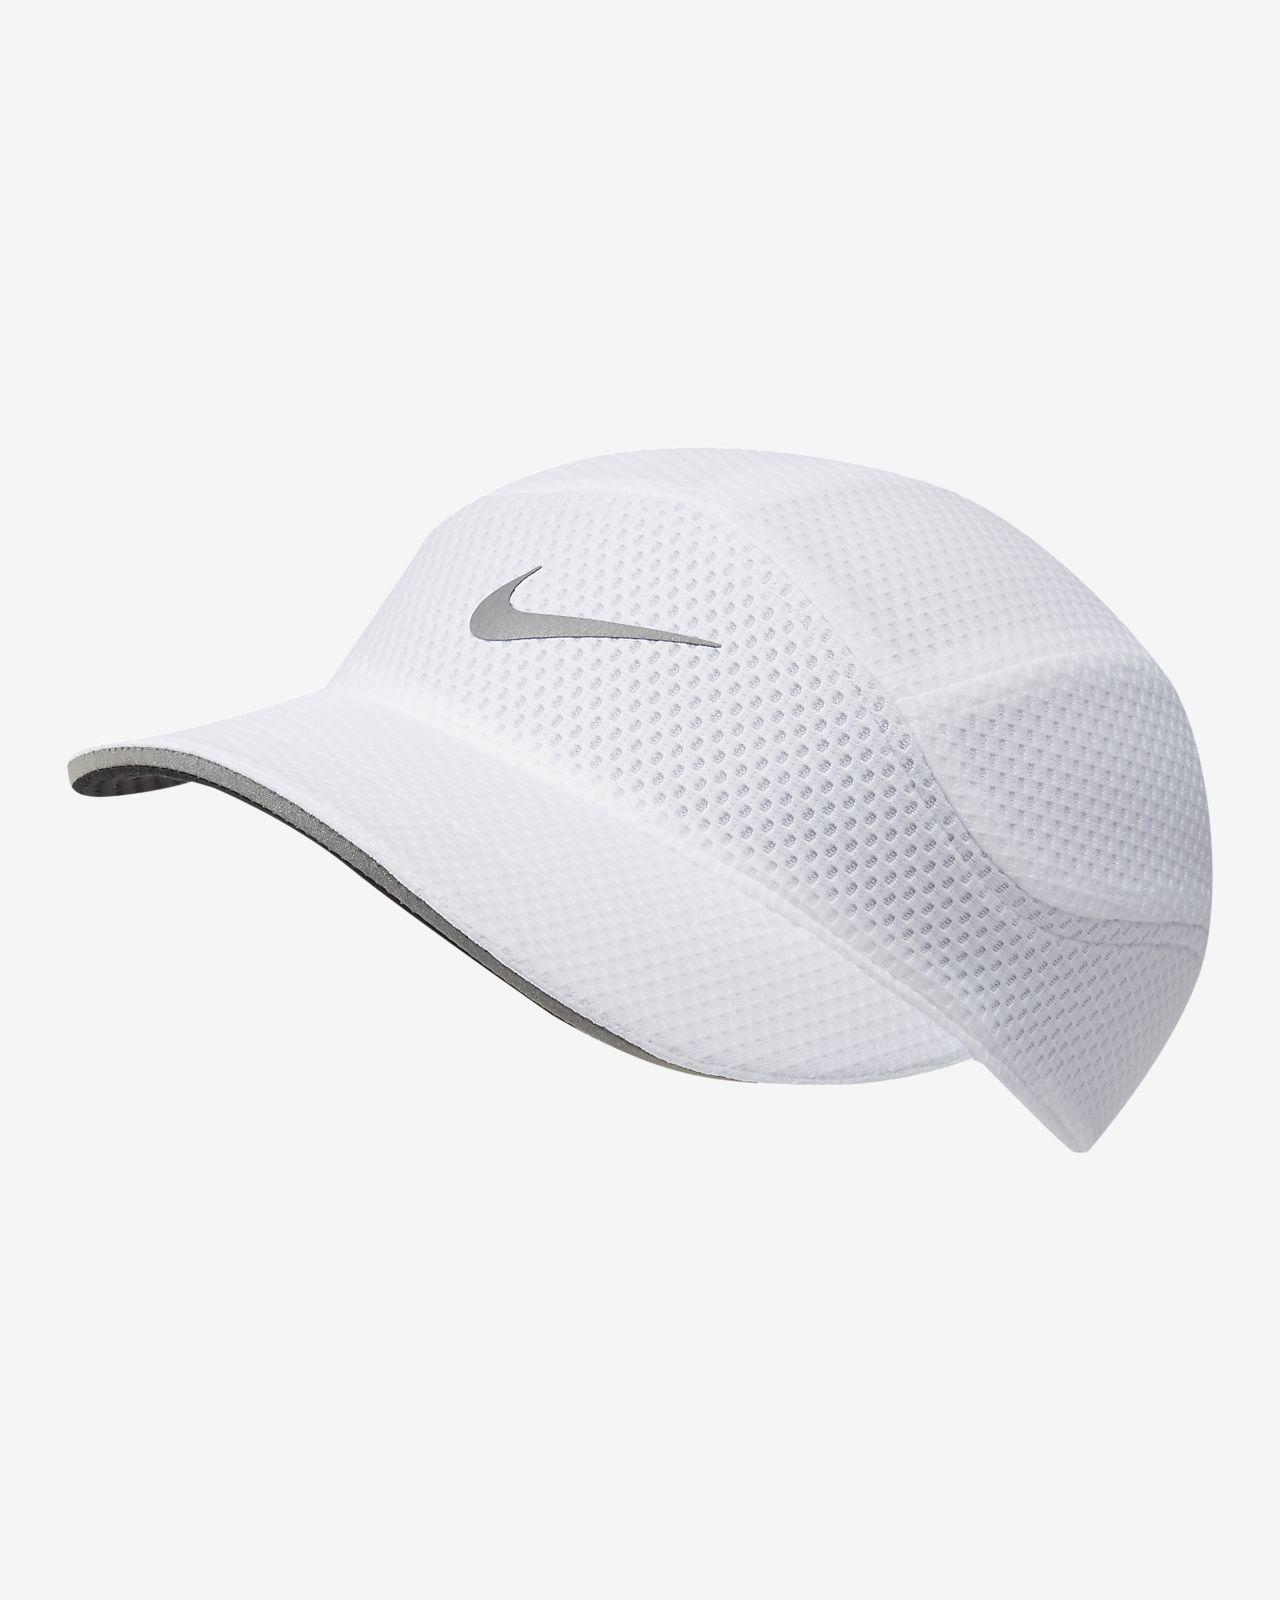 Nike AeroBill Tailwind Running Cap